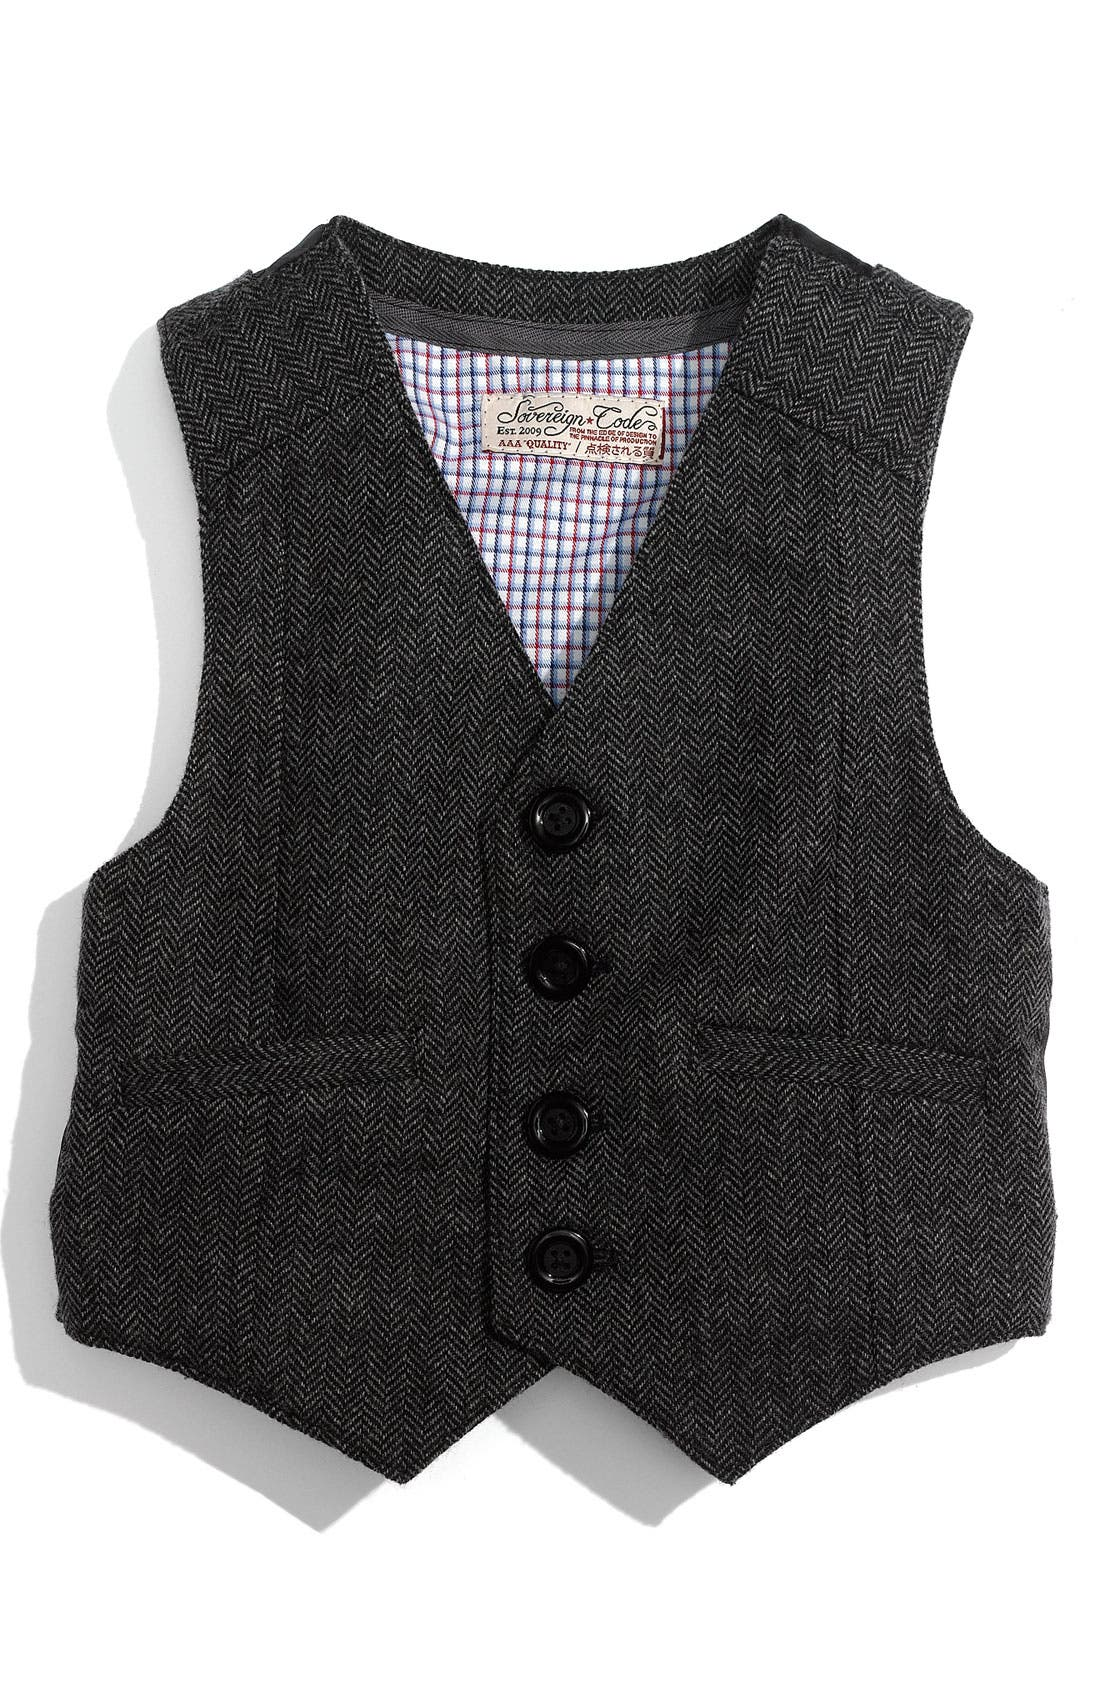 Main Image - Sovereign Code 'Lucas' Vest (Infant)